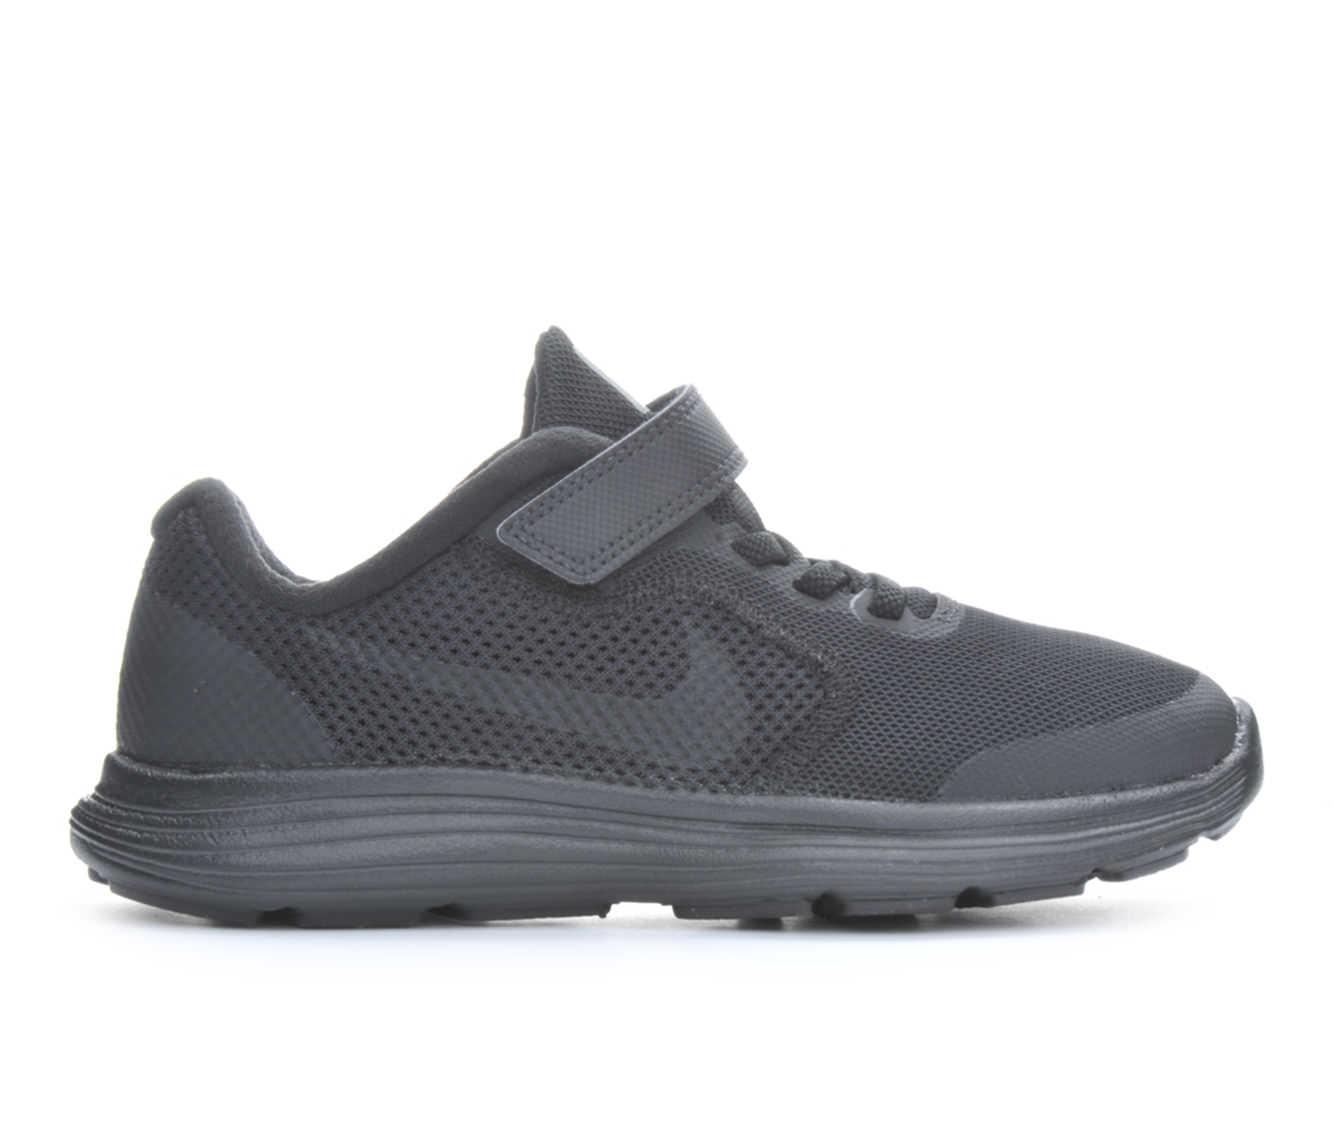 Boys' Nike Revolution 3 Athletic Shoes (Black)